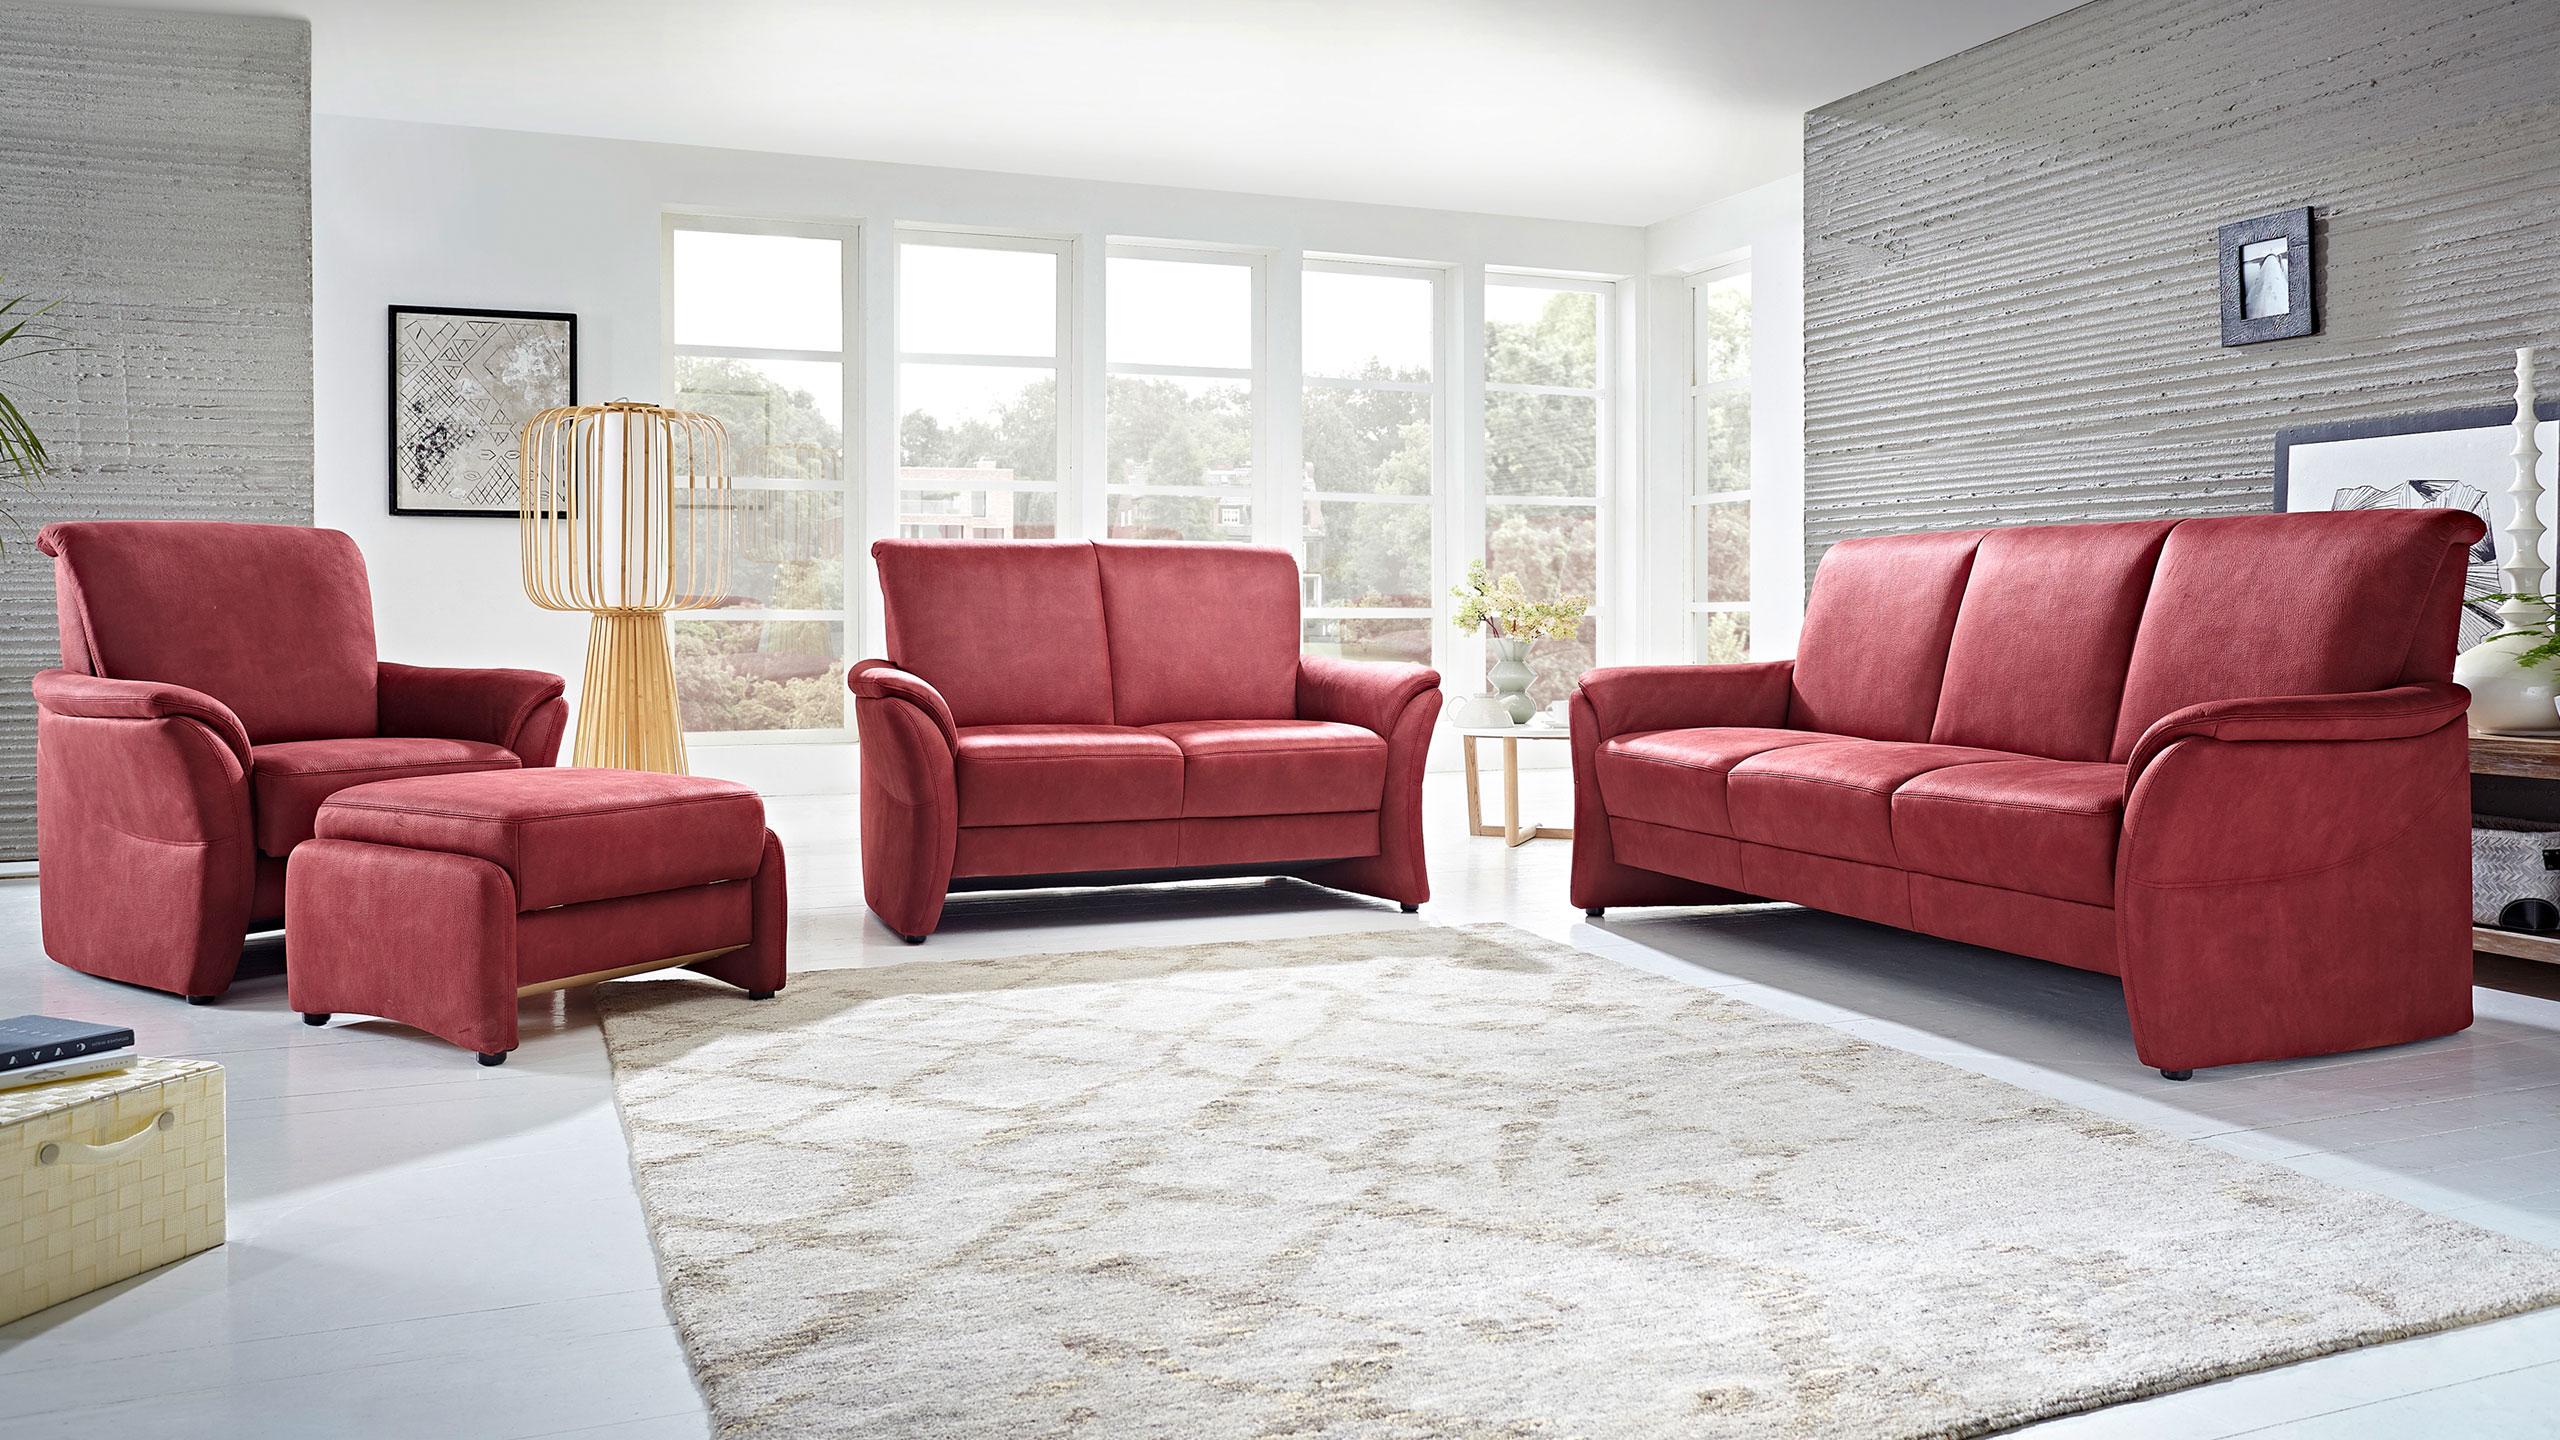 Volkach Sofa Garnitur Stoff Rot